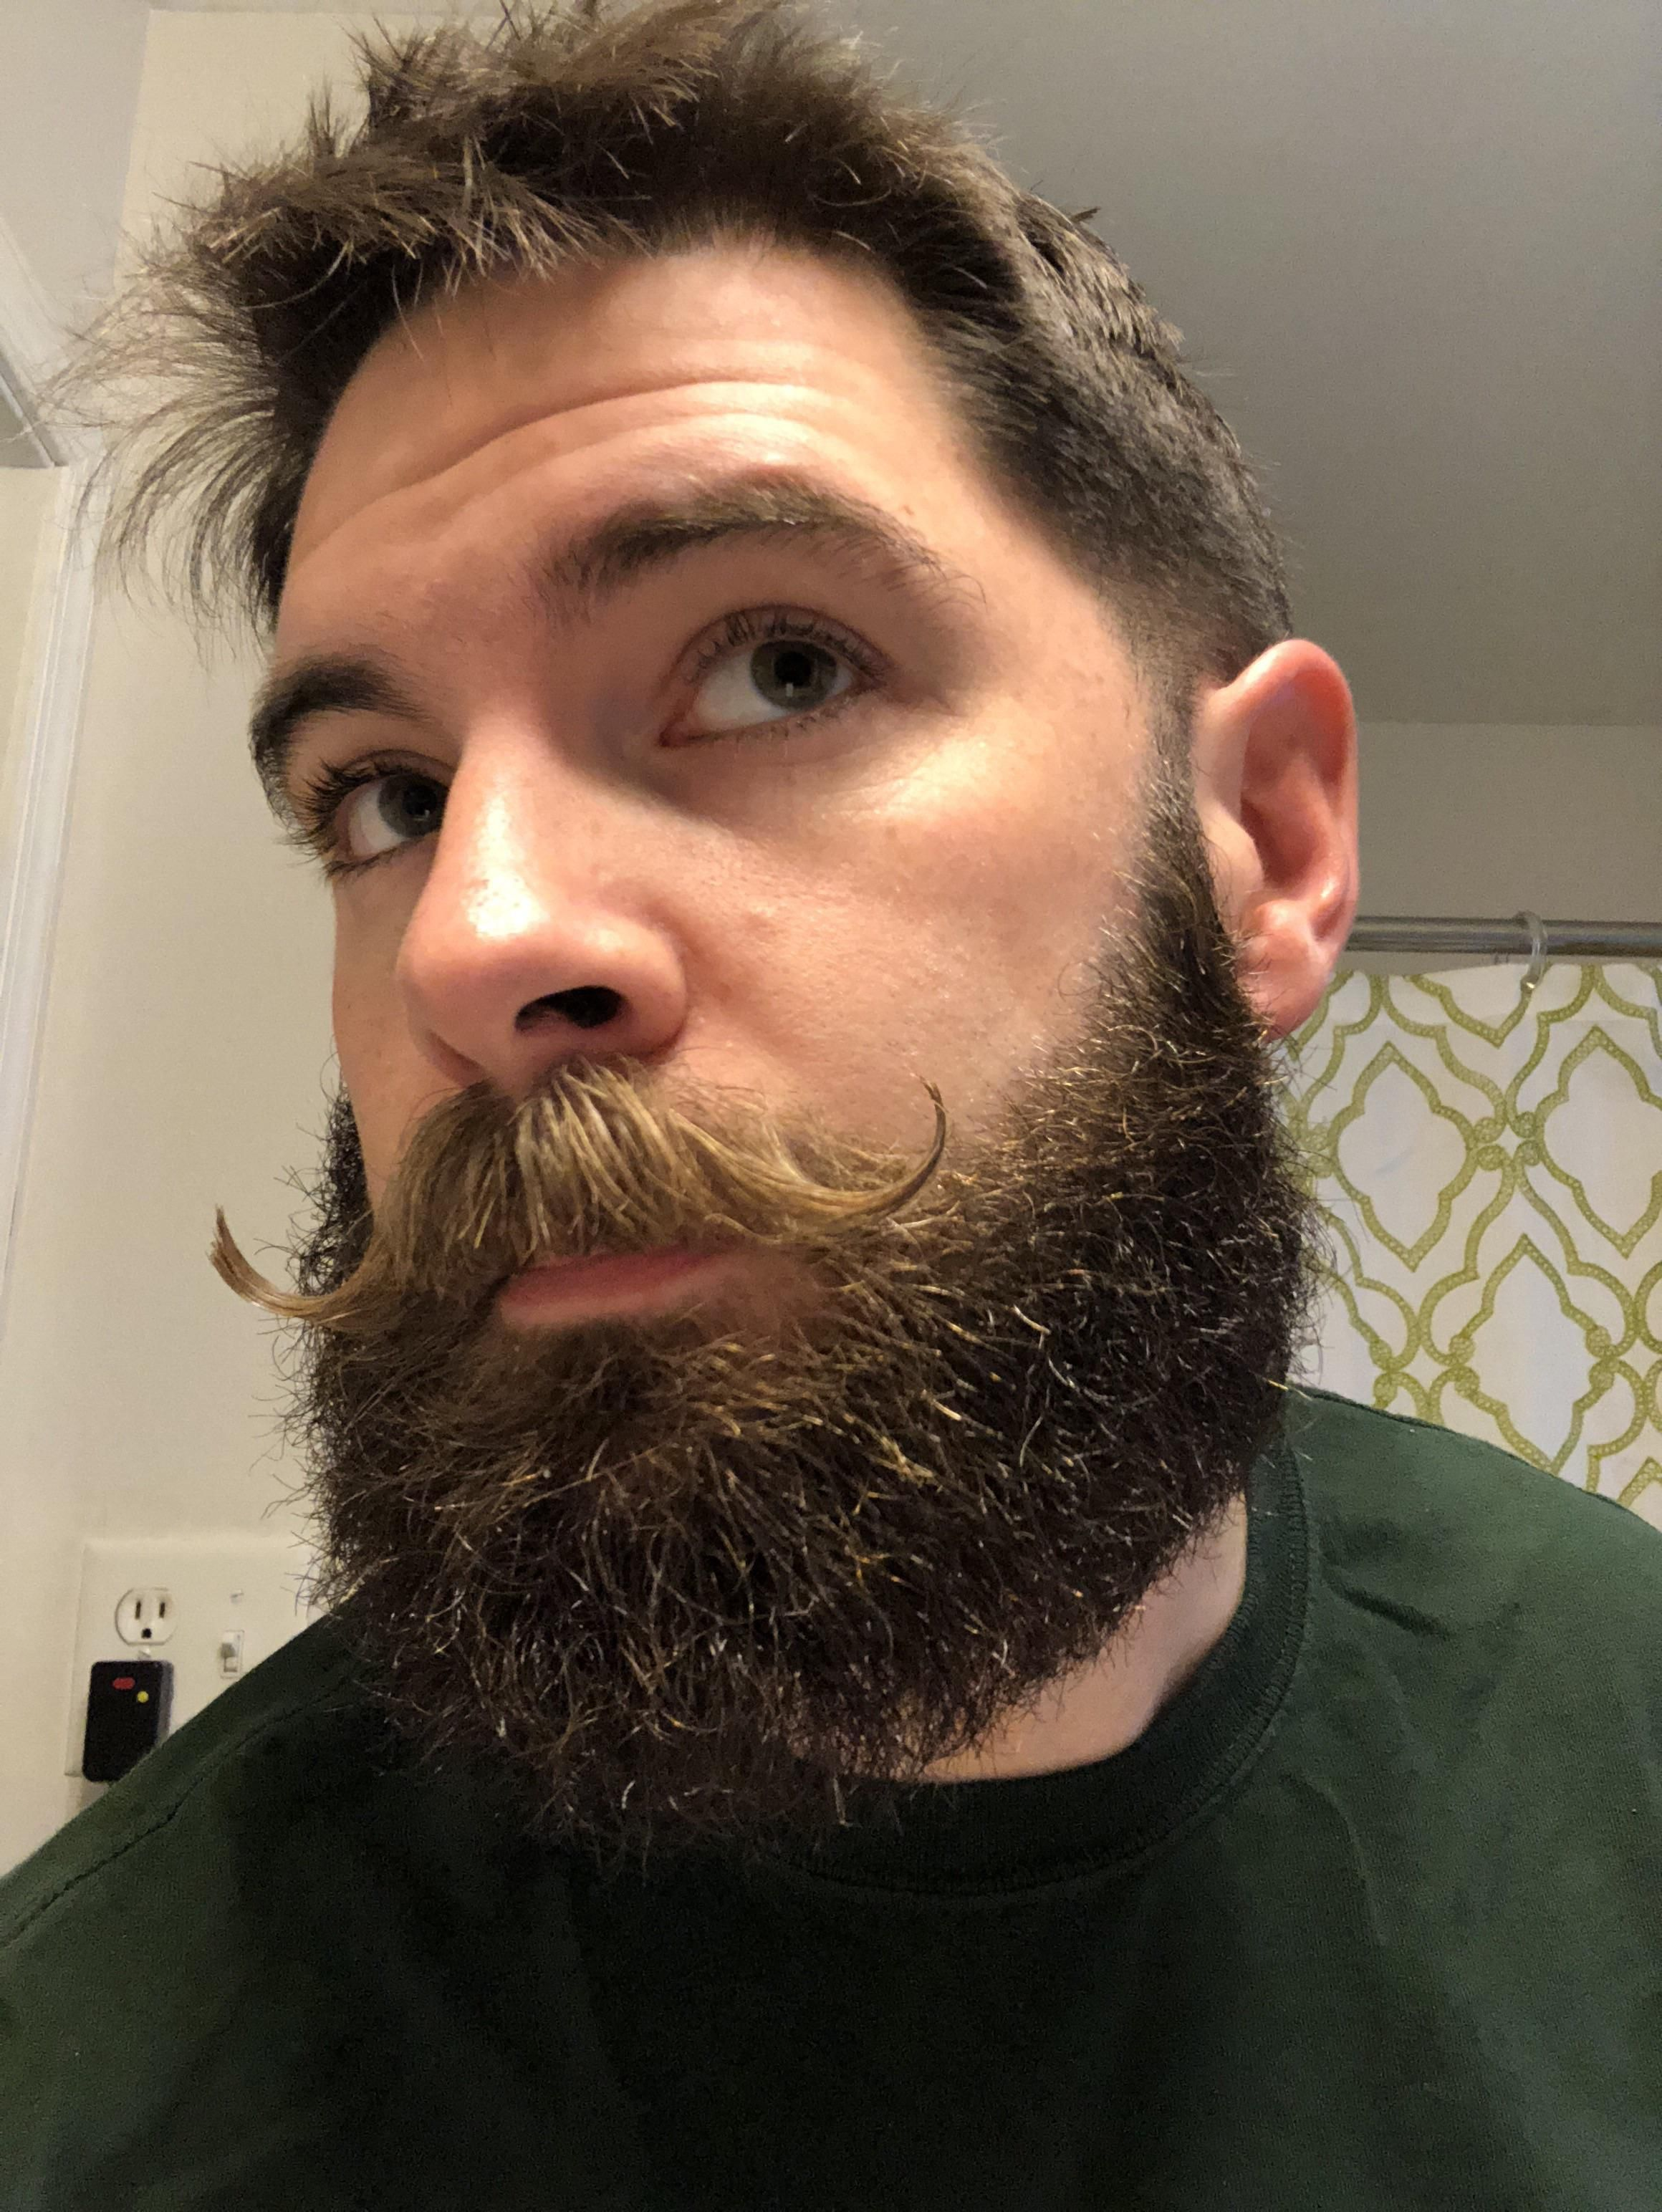 Blowout With Beard : blowout, beard, Getting, Things, Blowout, Curls, Beard, Mustache,, Styles,